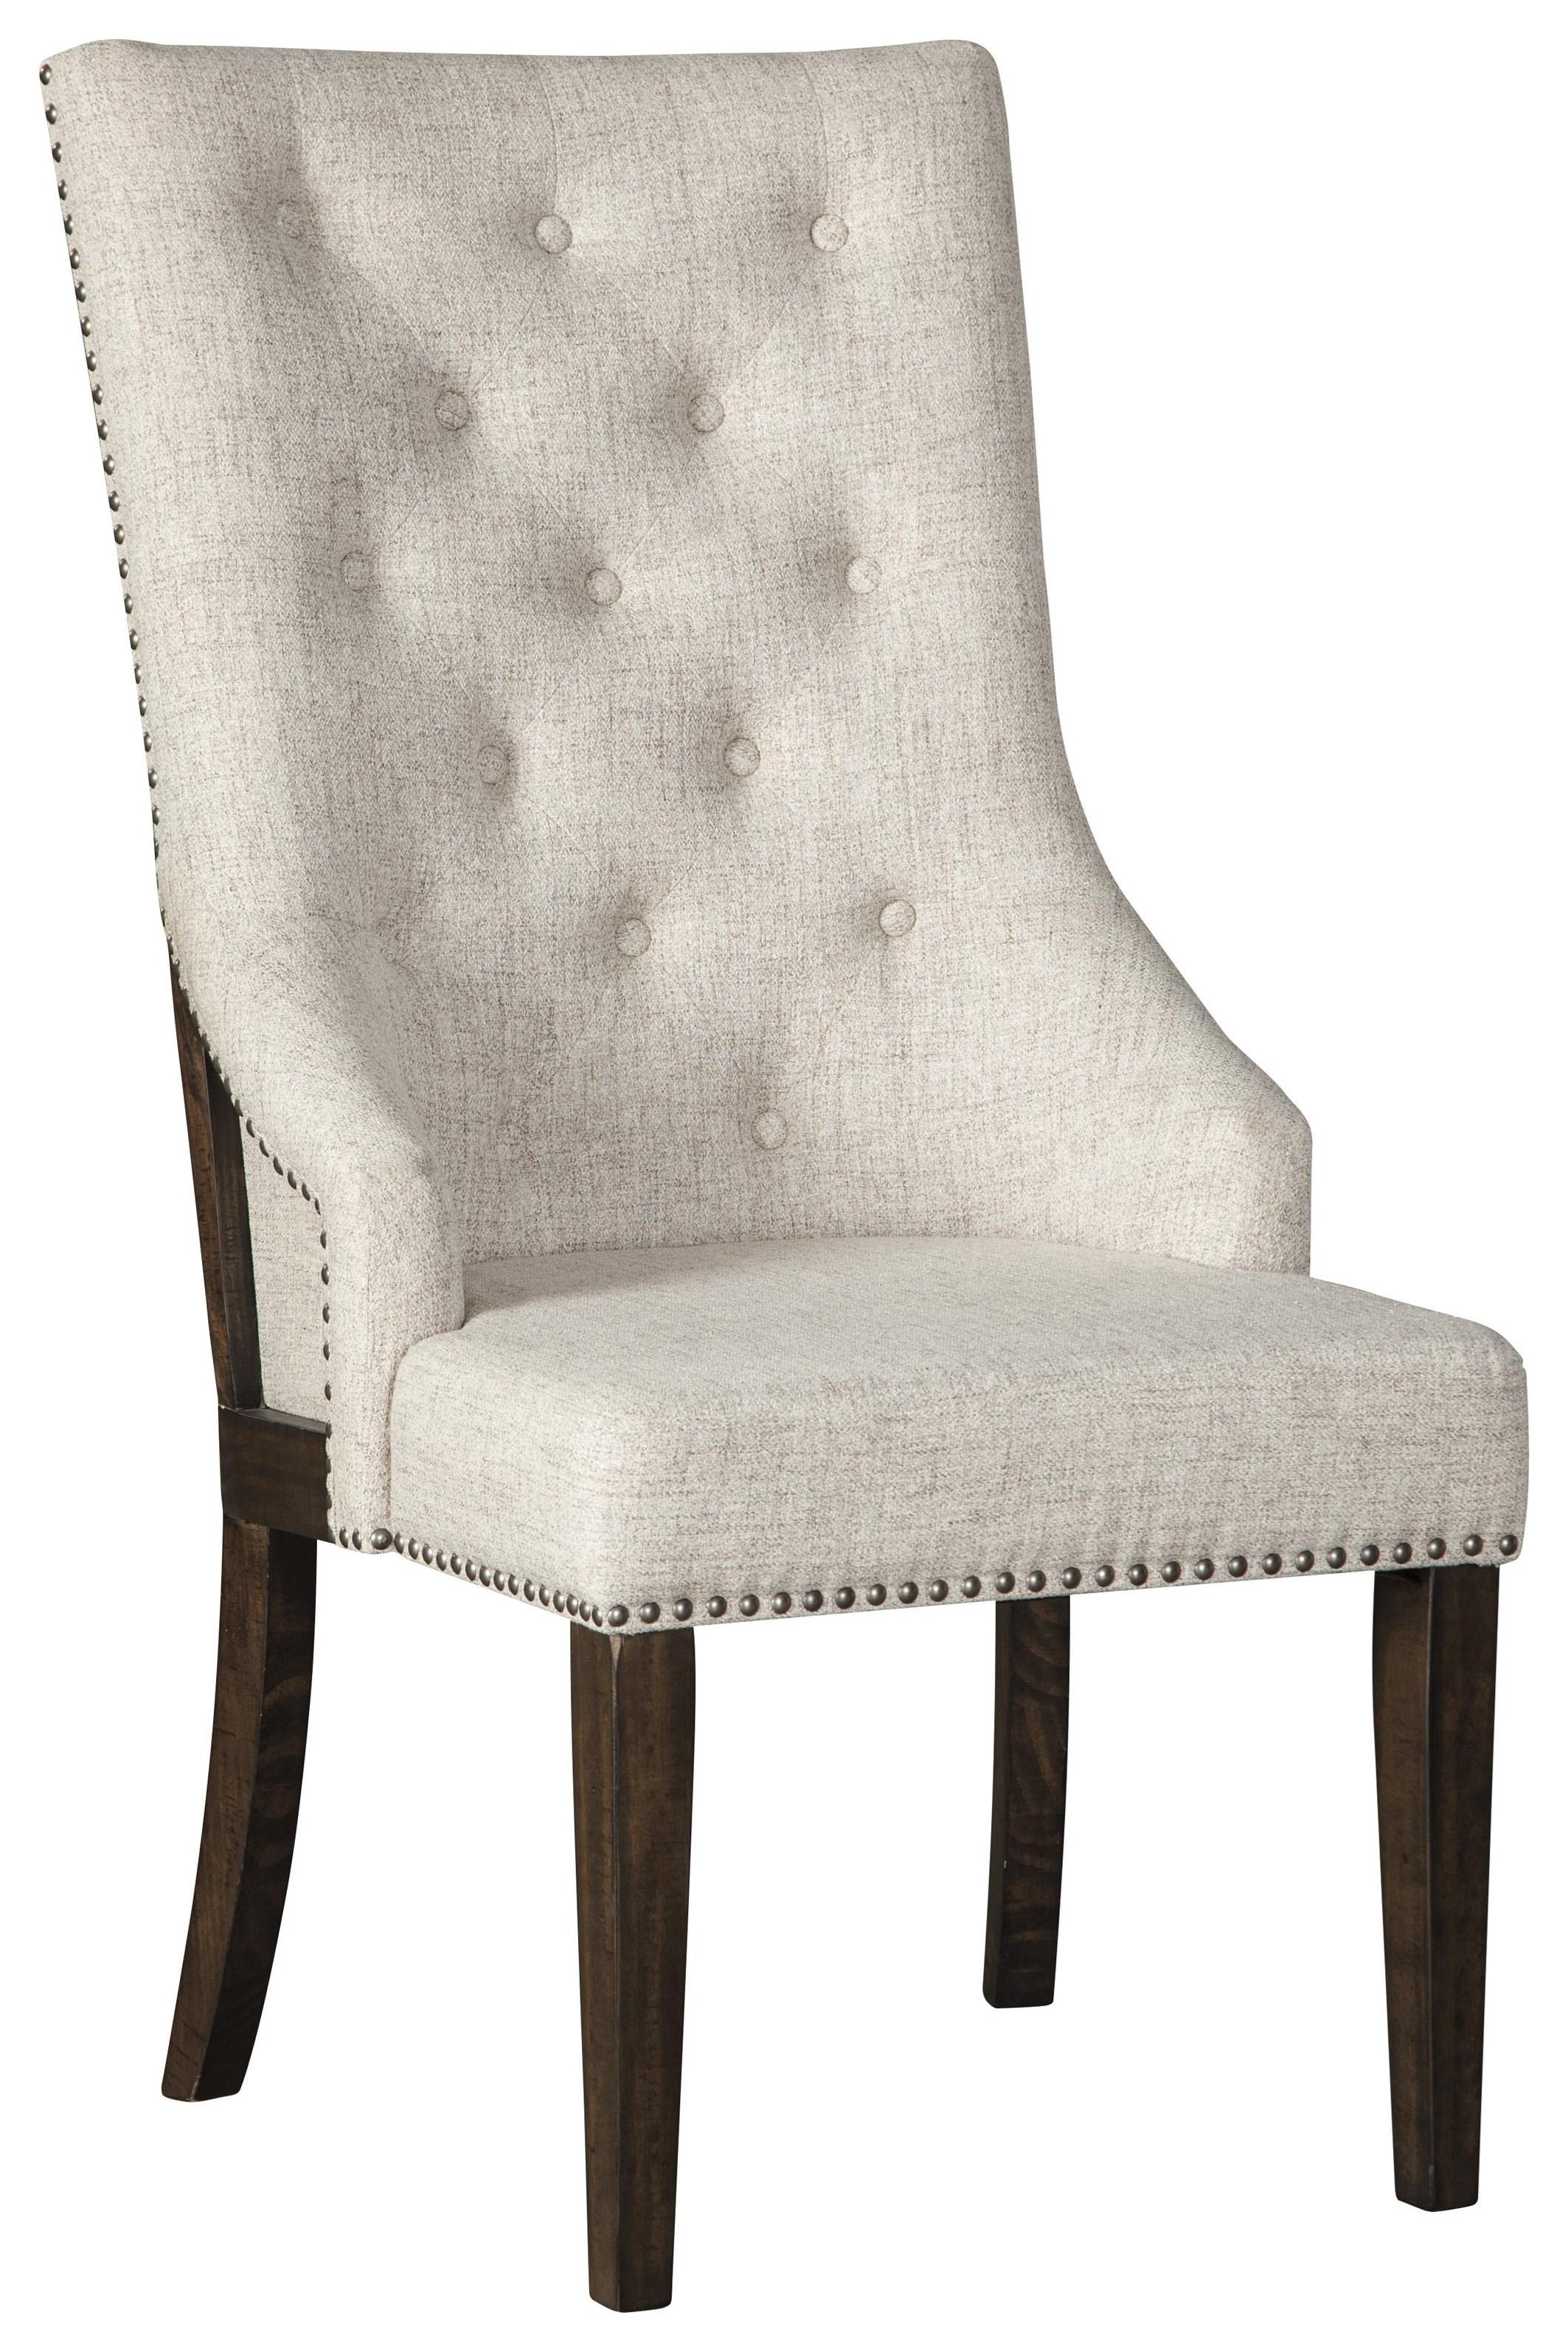 Hillcott Dining UPH Arm Chair by Millennium at Sam Levitz Furniture